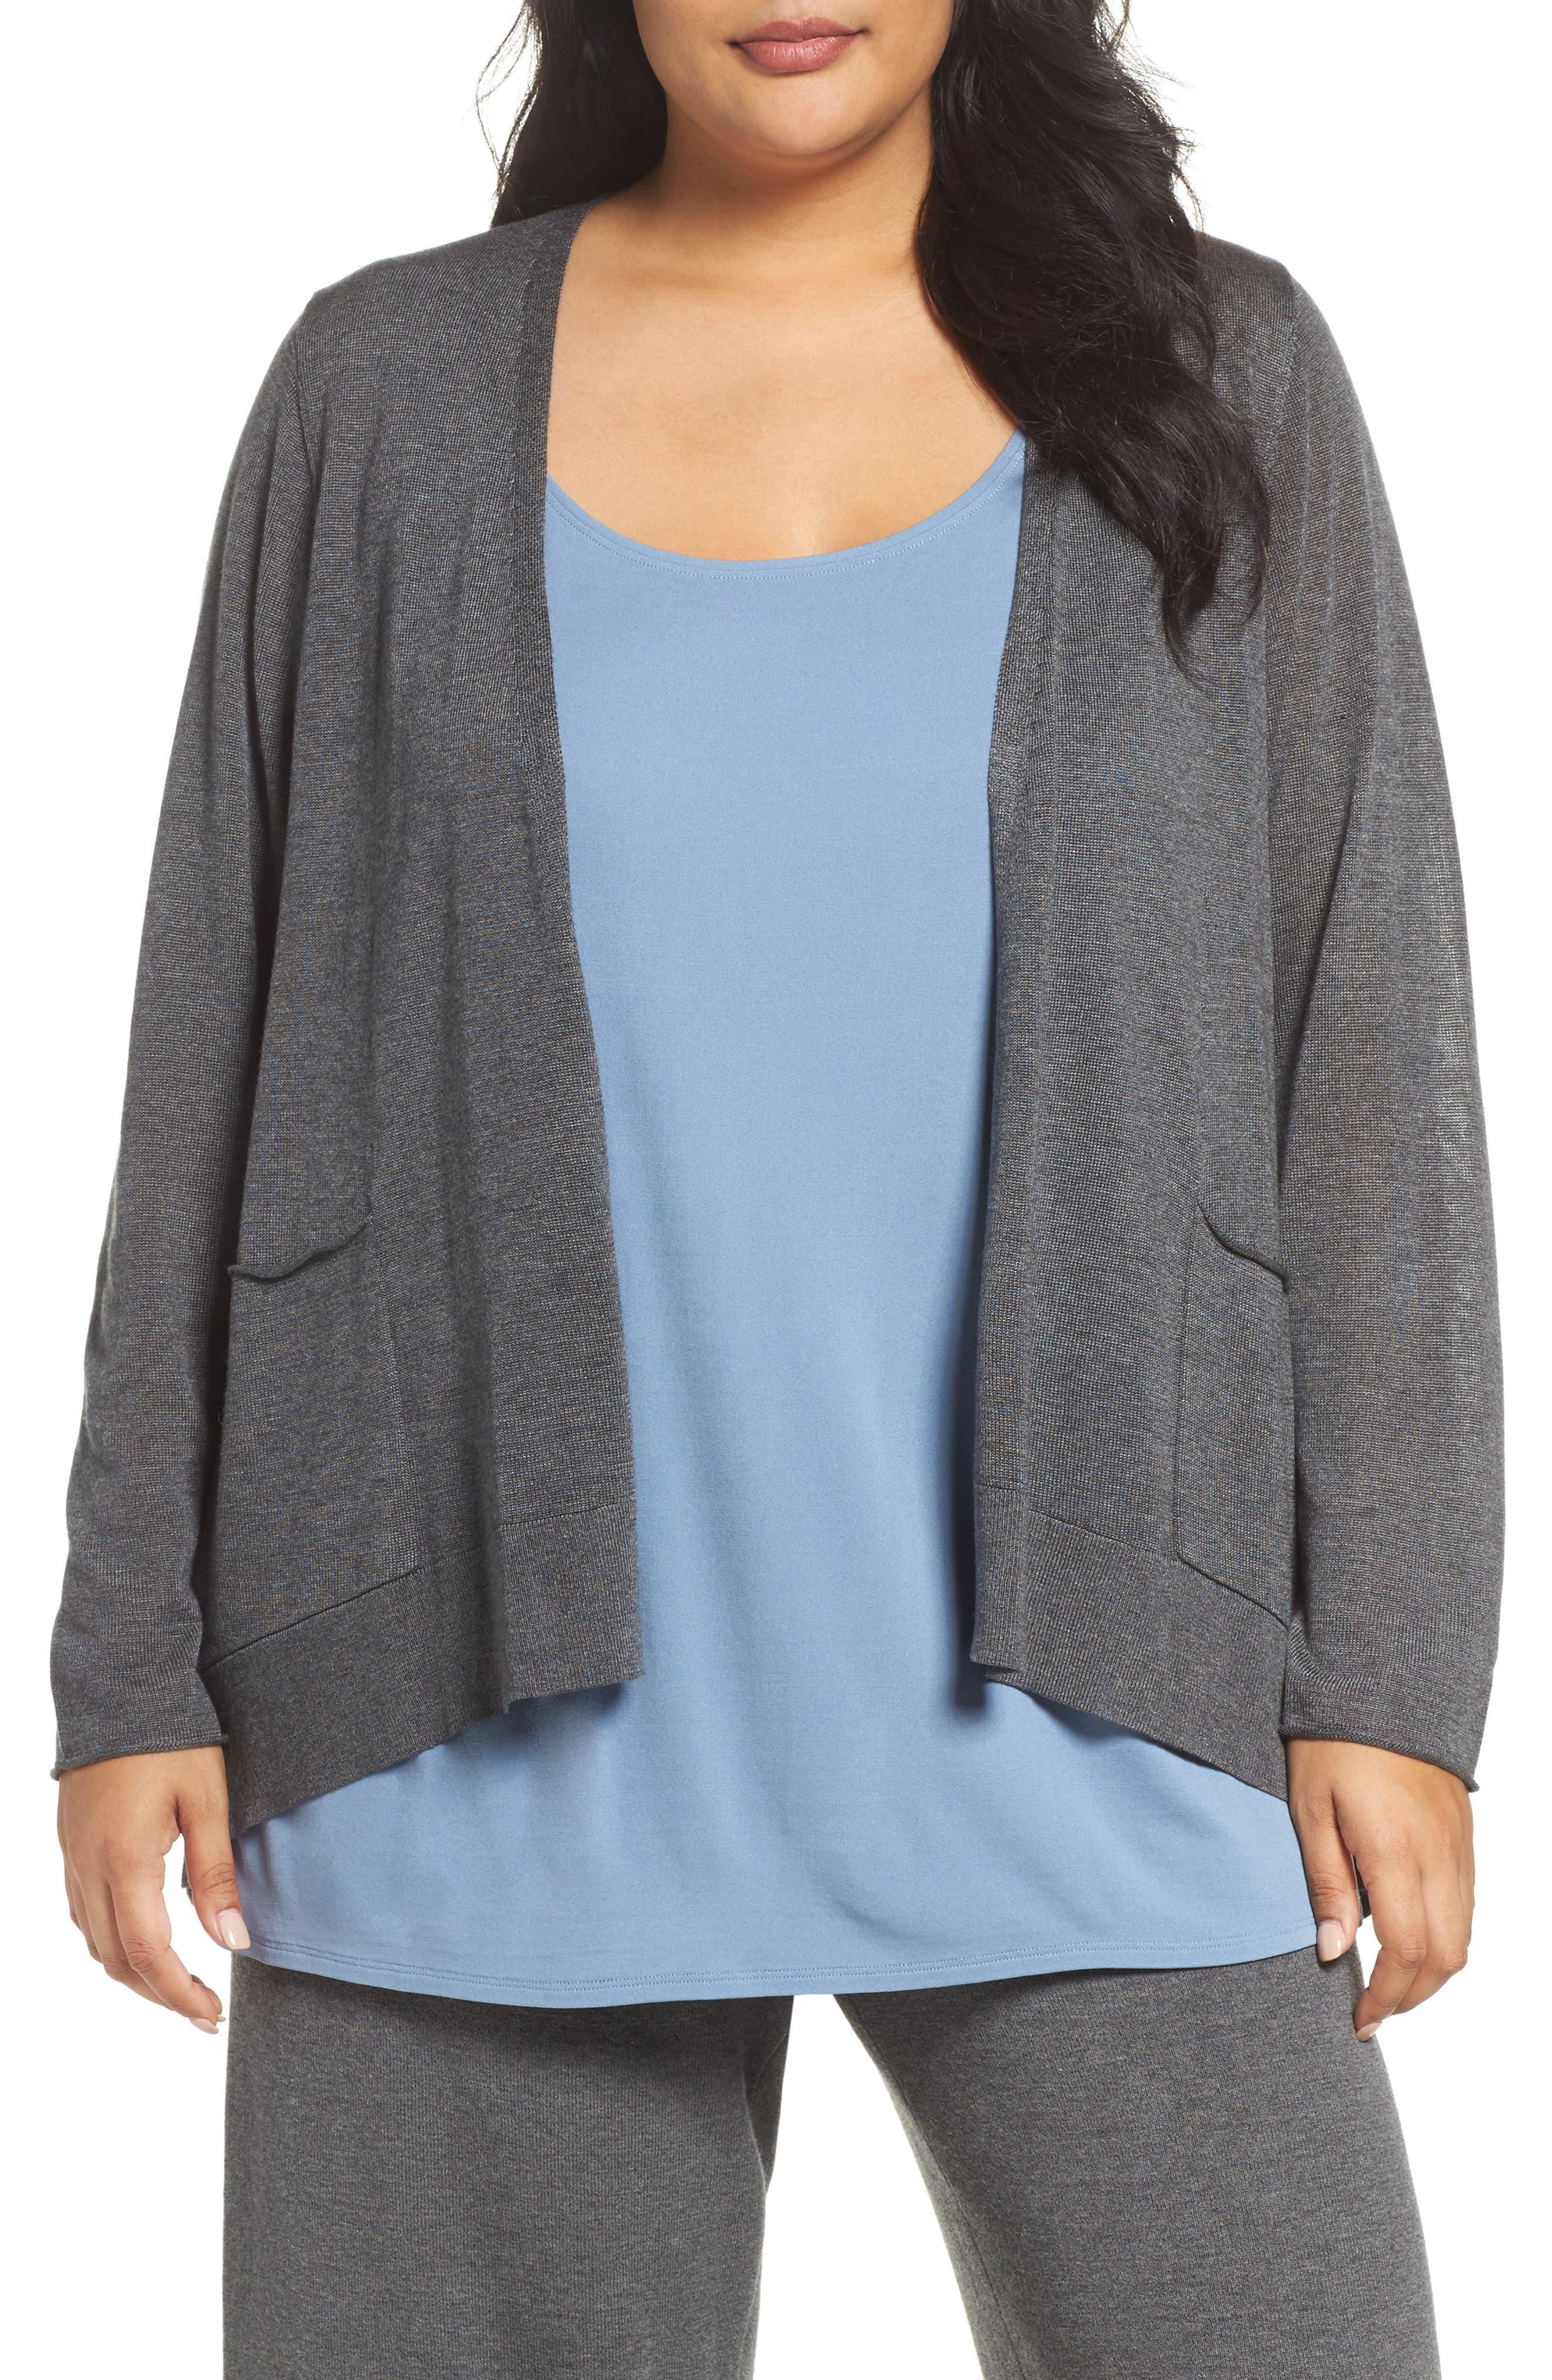 Main Image - Eileen Fisher Slouchy Tencel® Blend Cardigan (Plus Size)